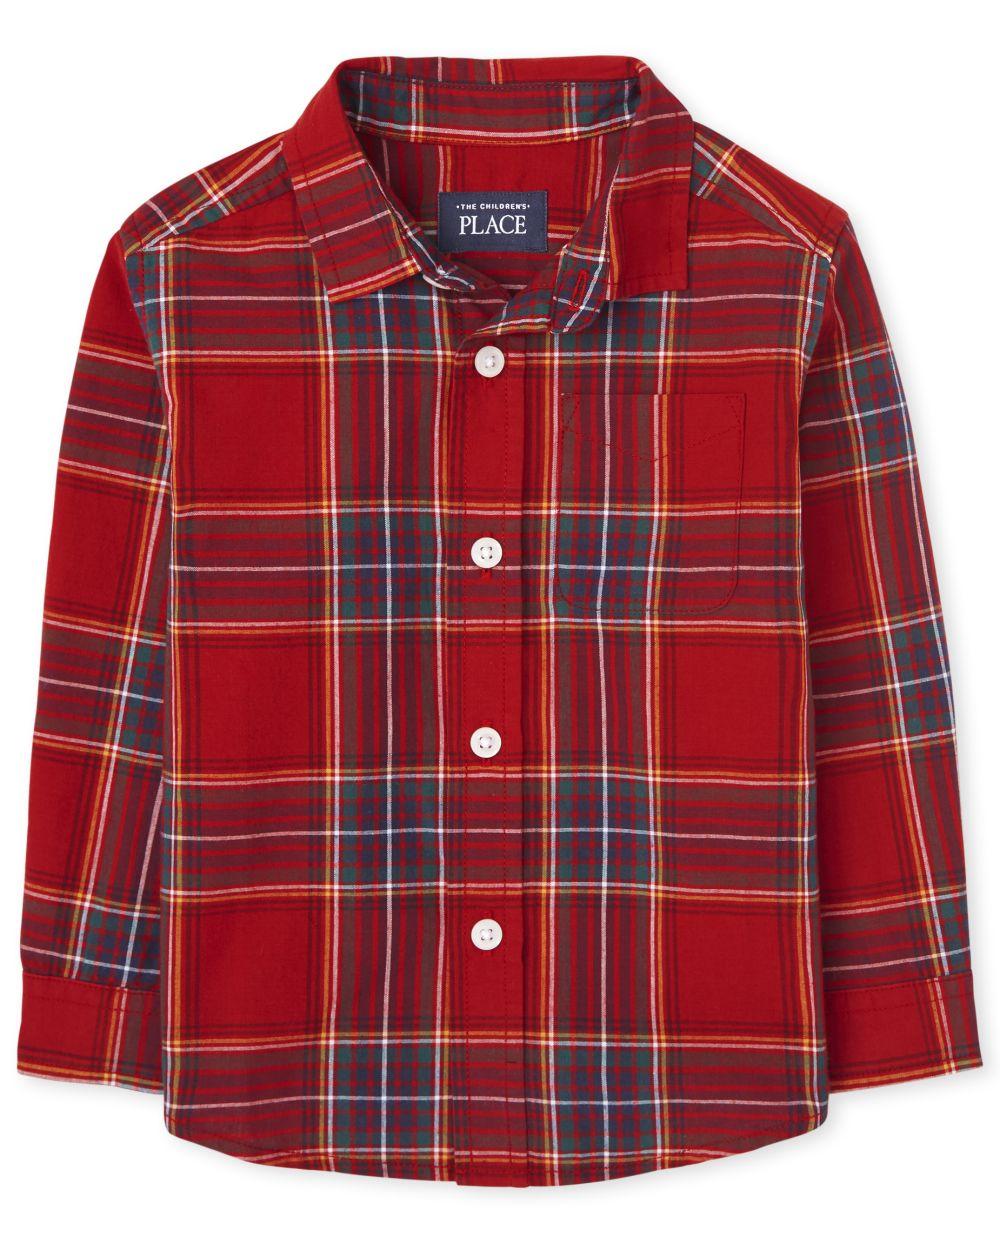 Toddler Boys Matching Family Plaid Poplin Button Down Shirt